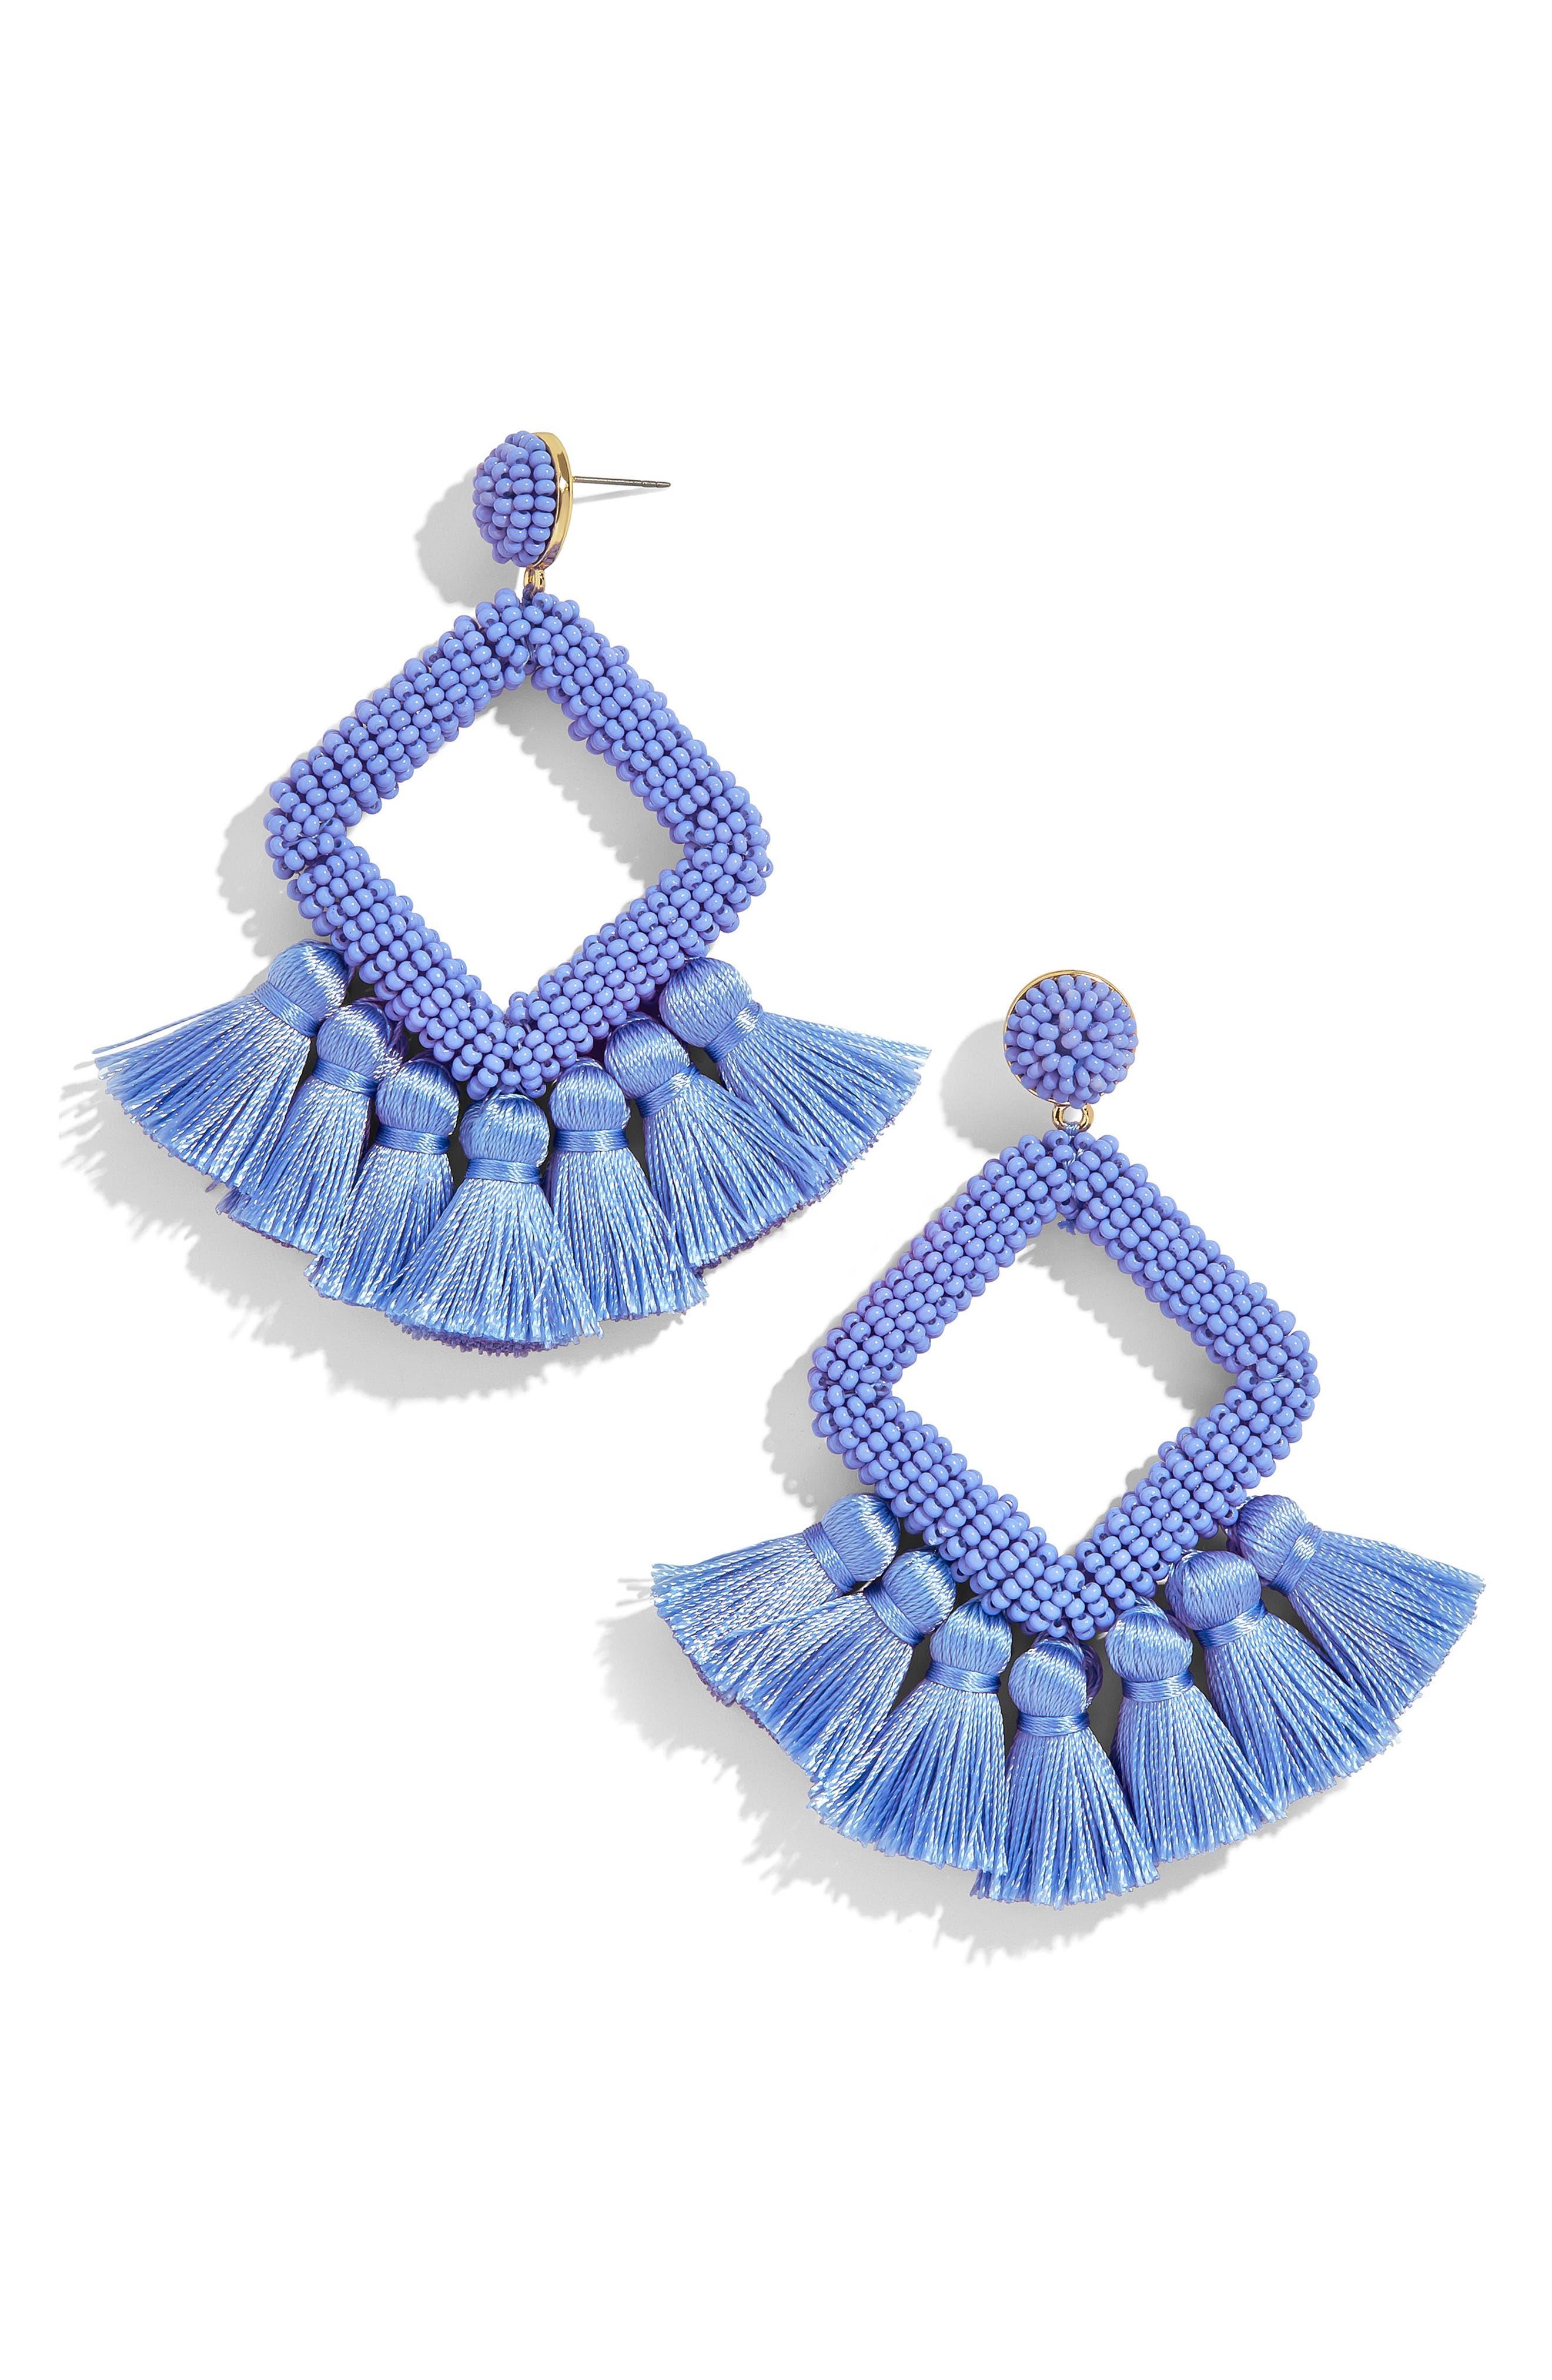 BAUBLEBAR, Laniyah Tassel Statement Earrings, Main thumbnail 1, color, 400